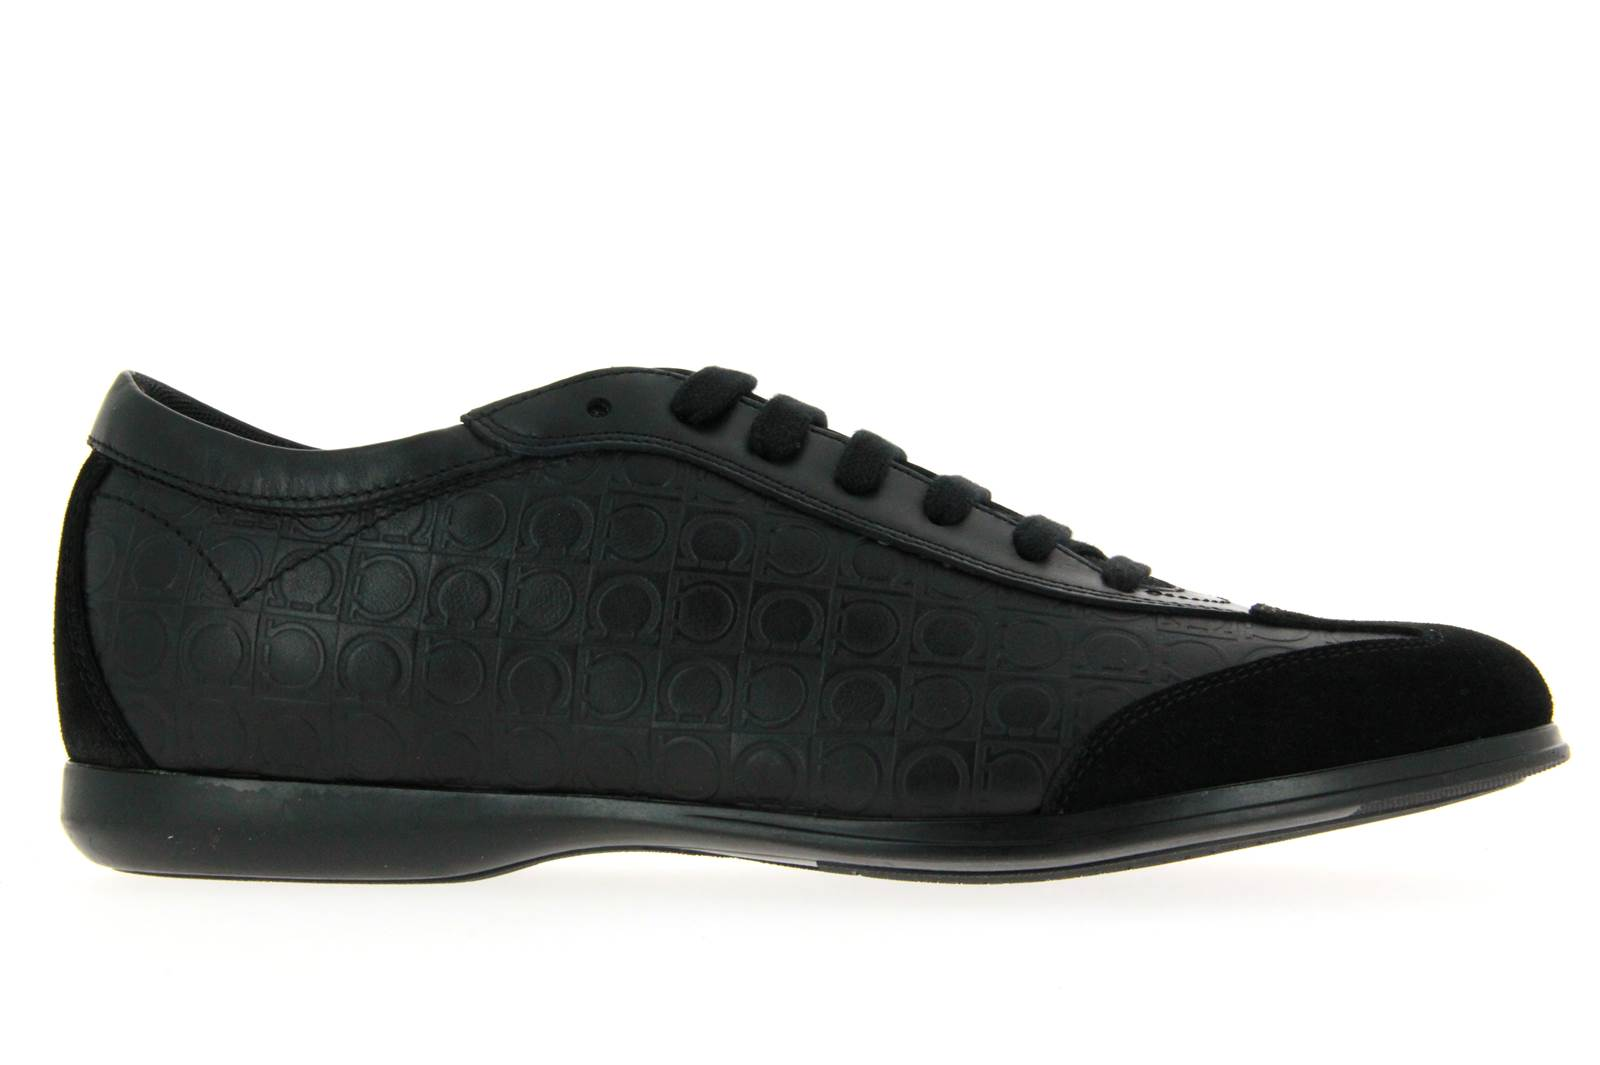 Salvatore Ferragamo Sneaker - FALKLAND NERO SUEDE CALF